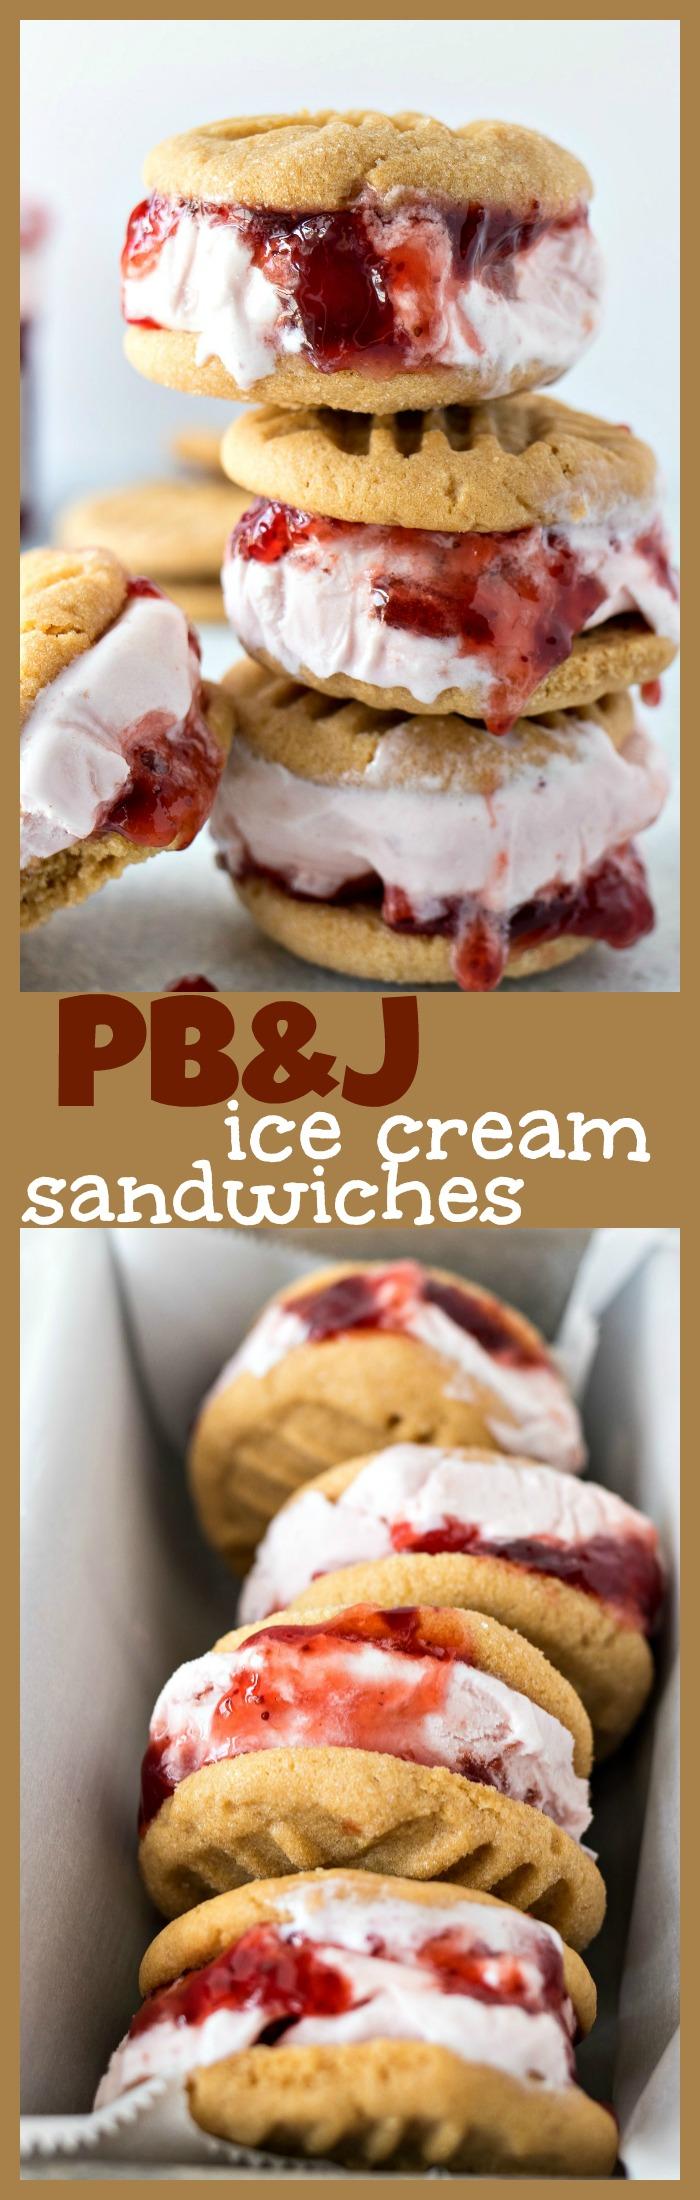 PB&J Ice Cream Sandwiches photo collage